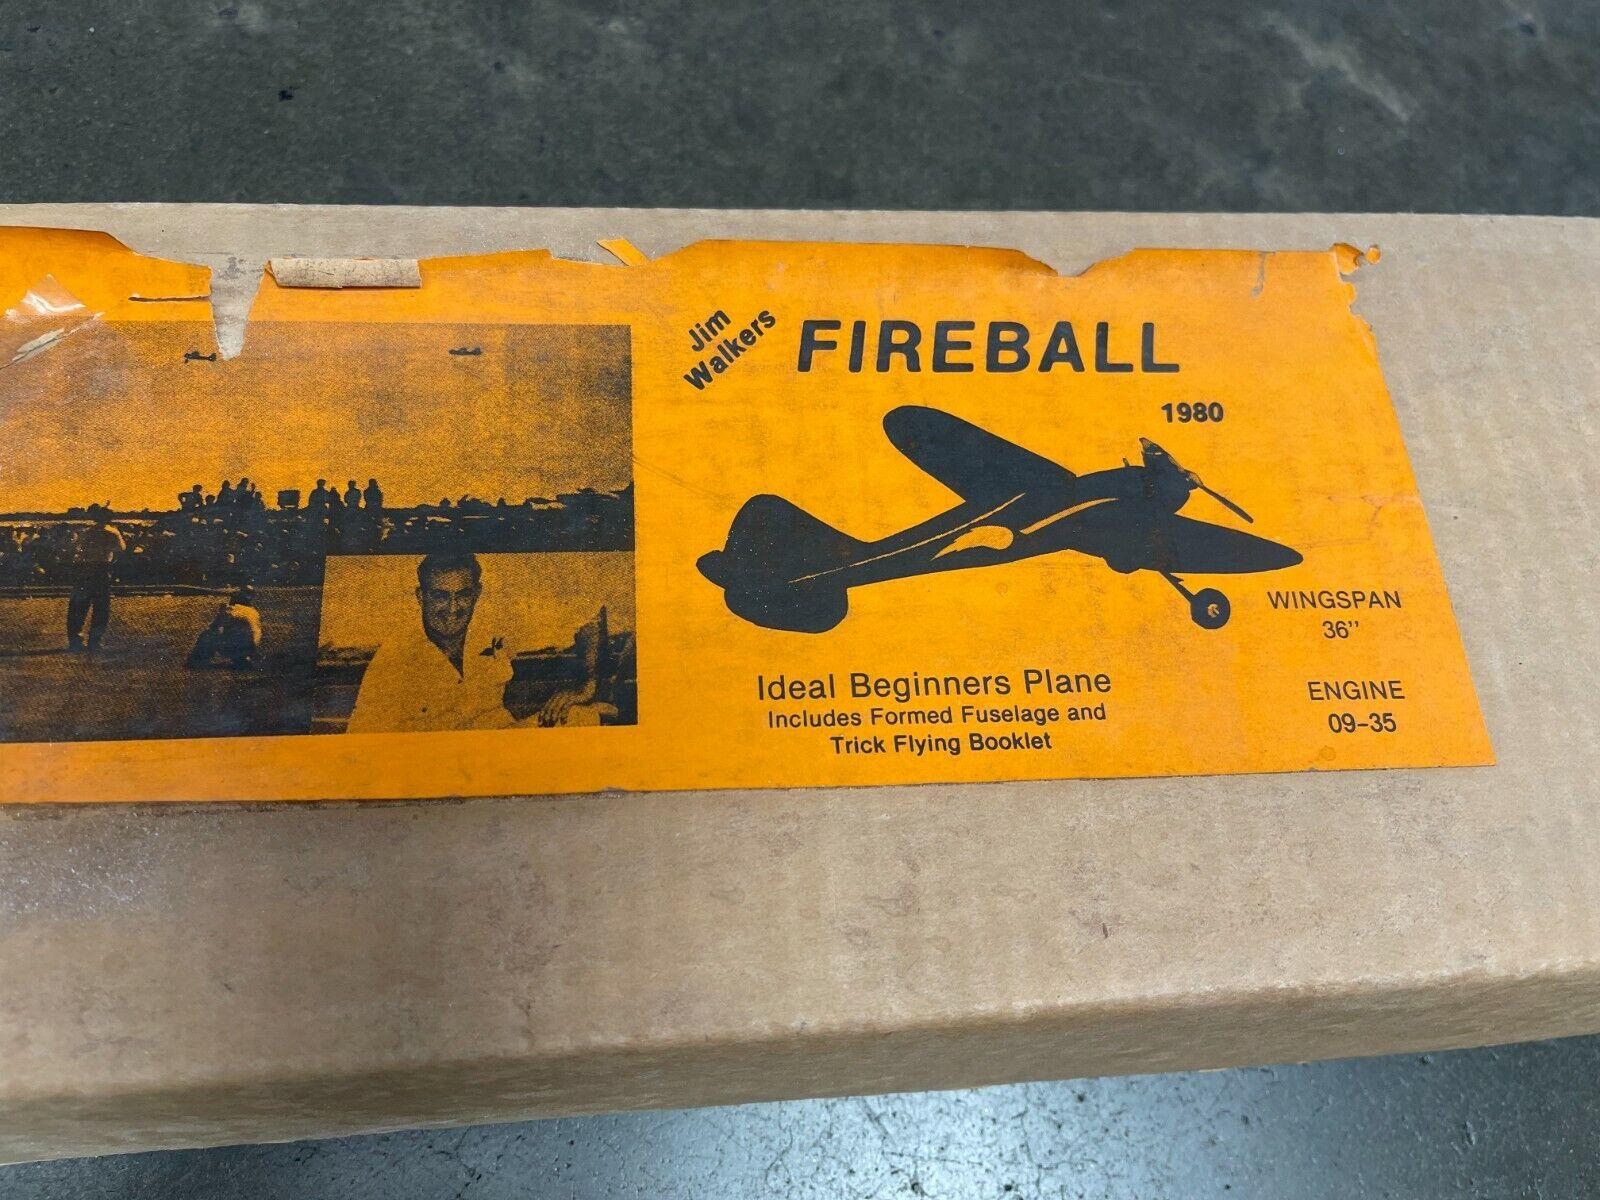 Jim Walkers's The FIREBALL 1980 Control Line Model Airplane kit